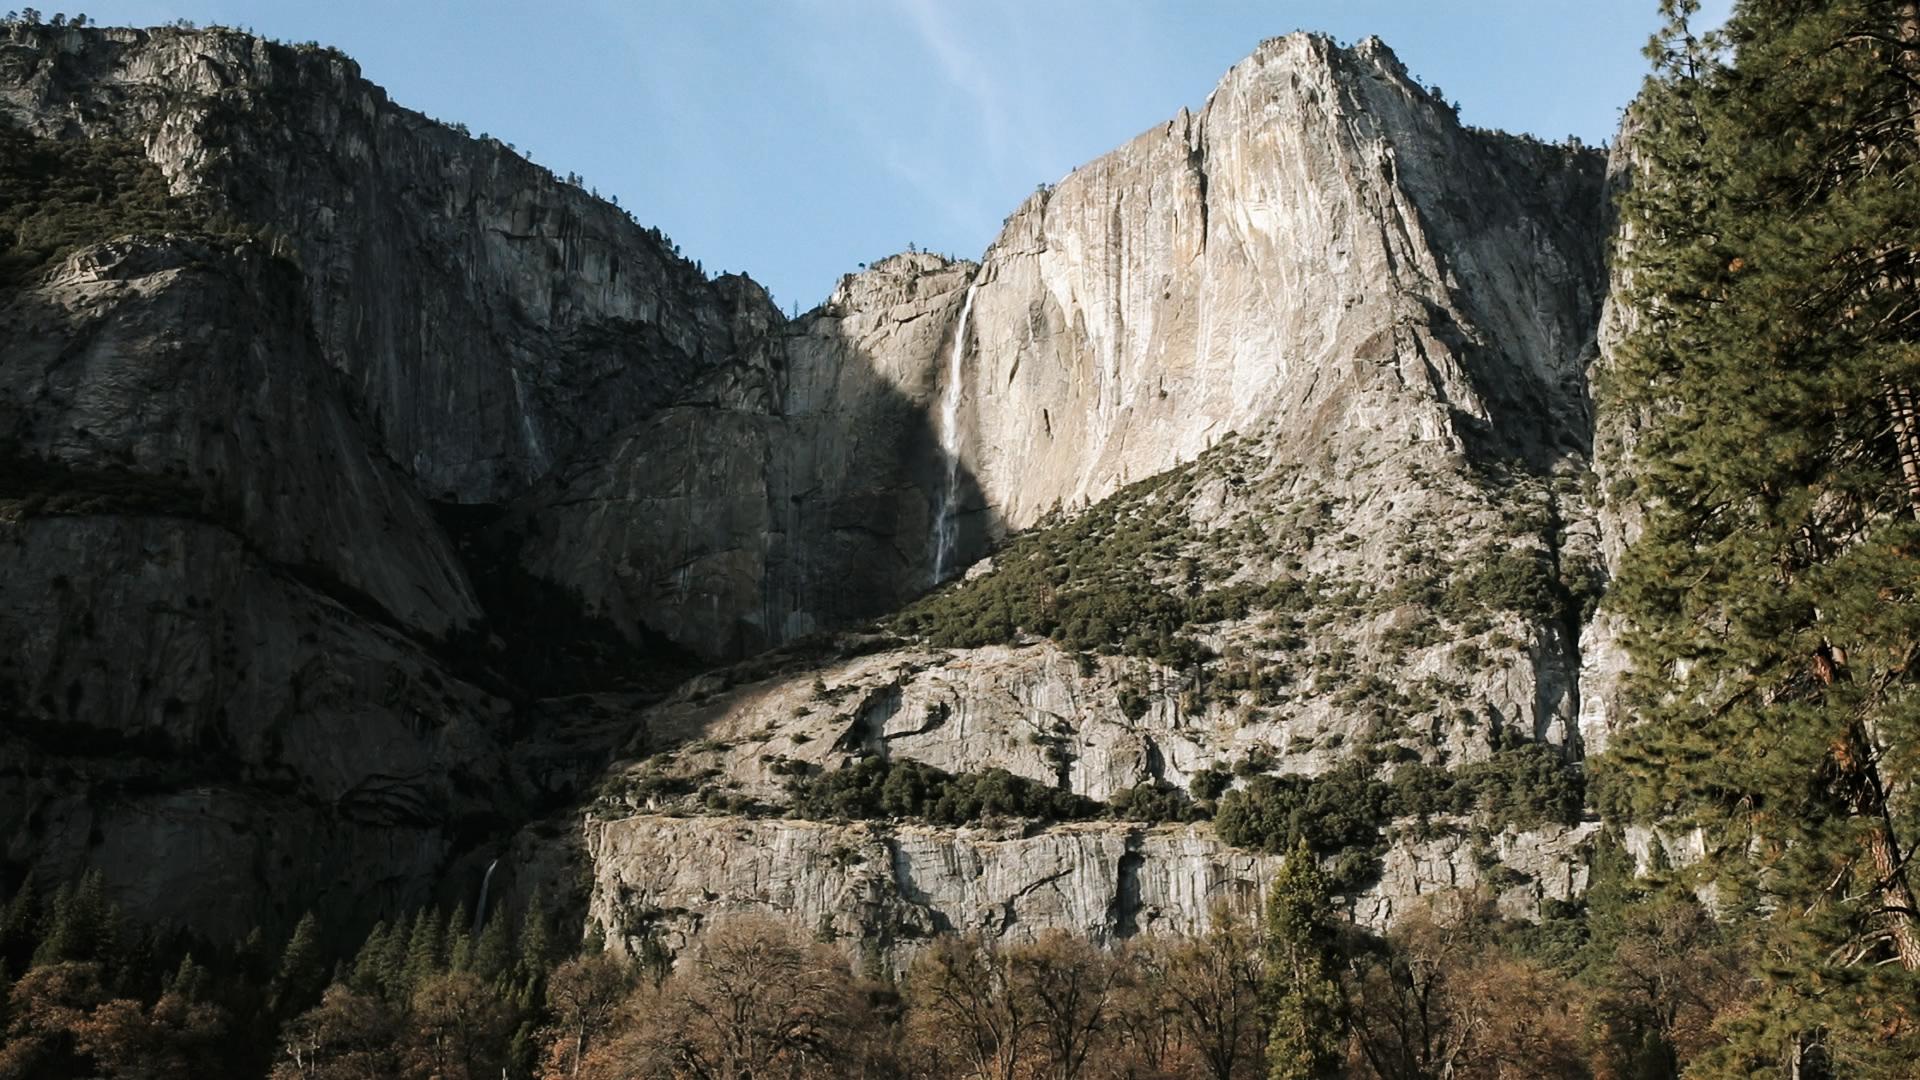 Yosemite National Park Elopement - Elopement Videographer - Destination Elopement Photographer